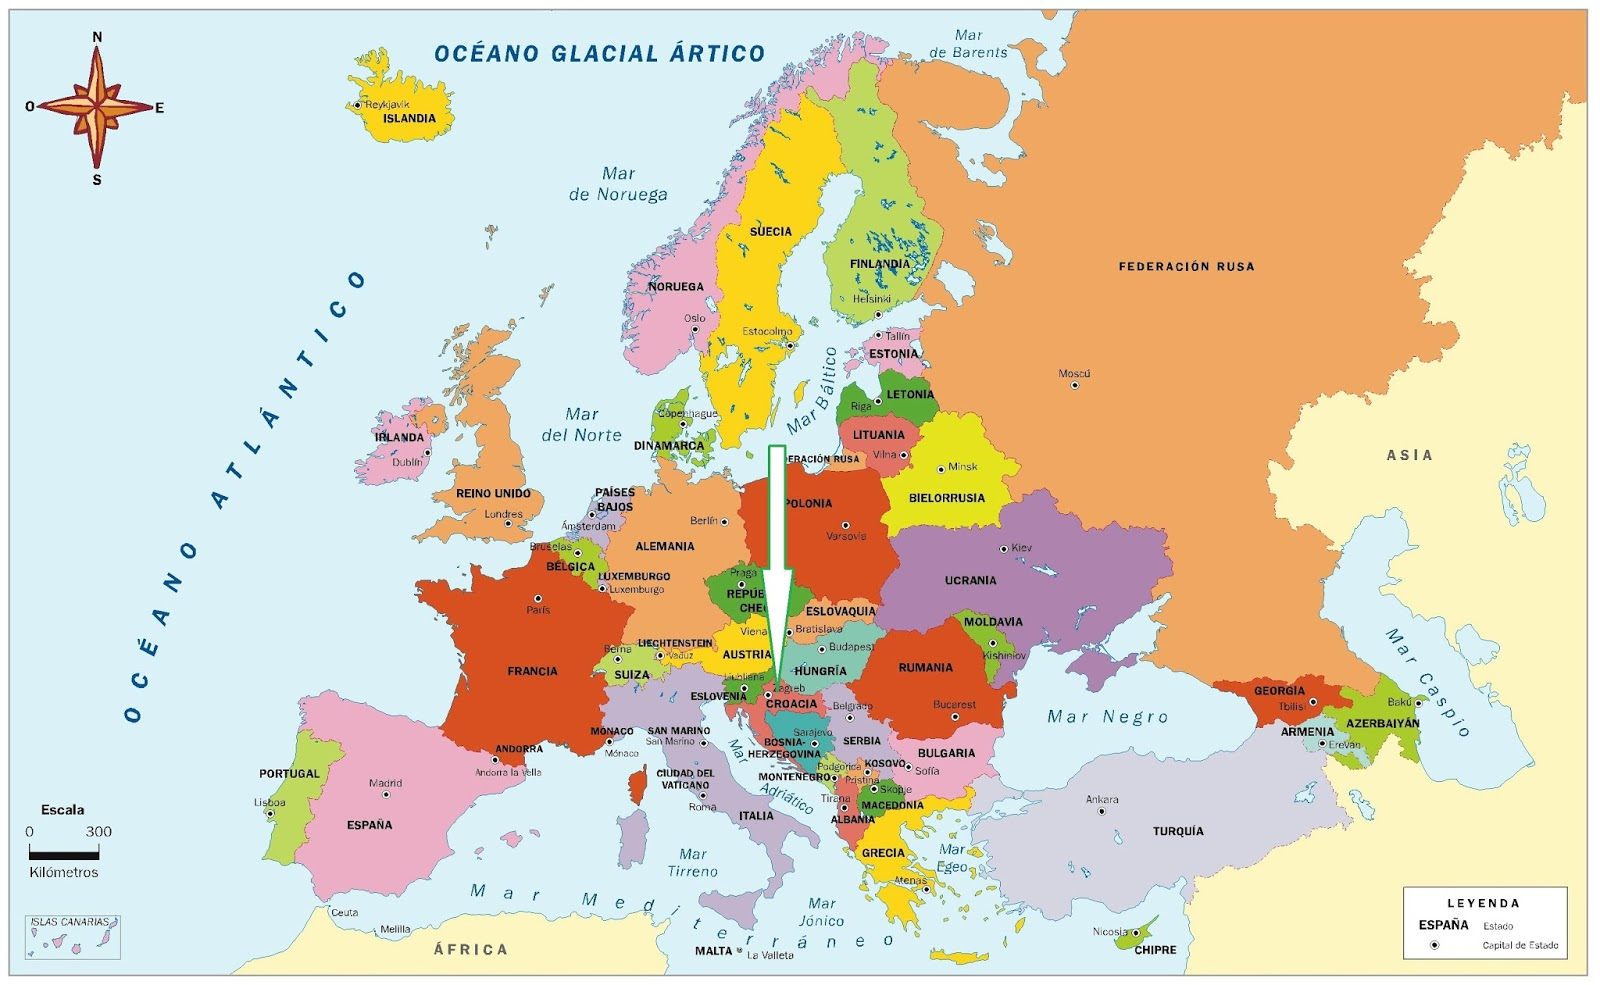 croacia mapa mundo CruxSancta: Desde Croacia: testimonio sobre el CNC   Camino  croacia mapa mundo